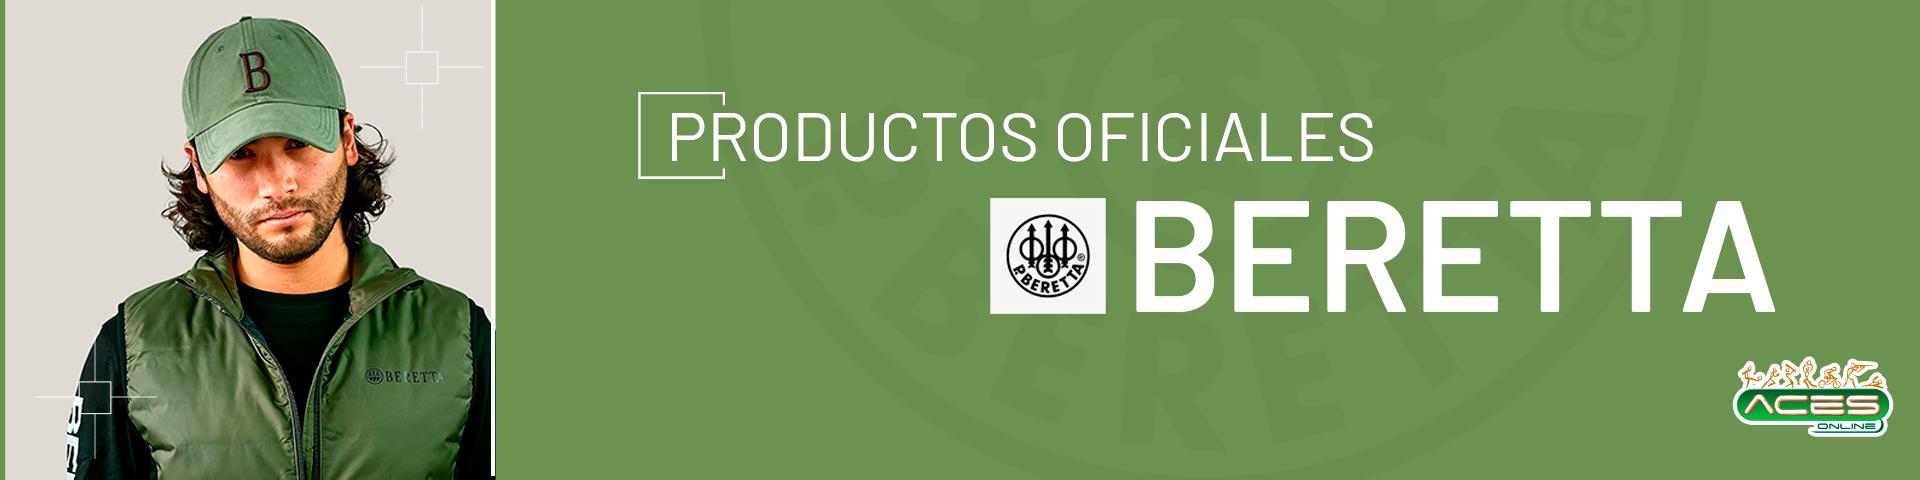 productos_beretta_aces_online